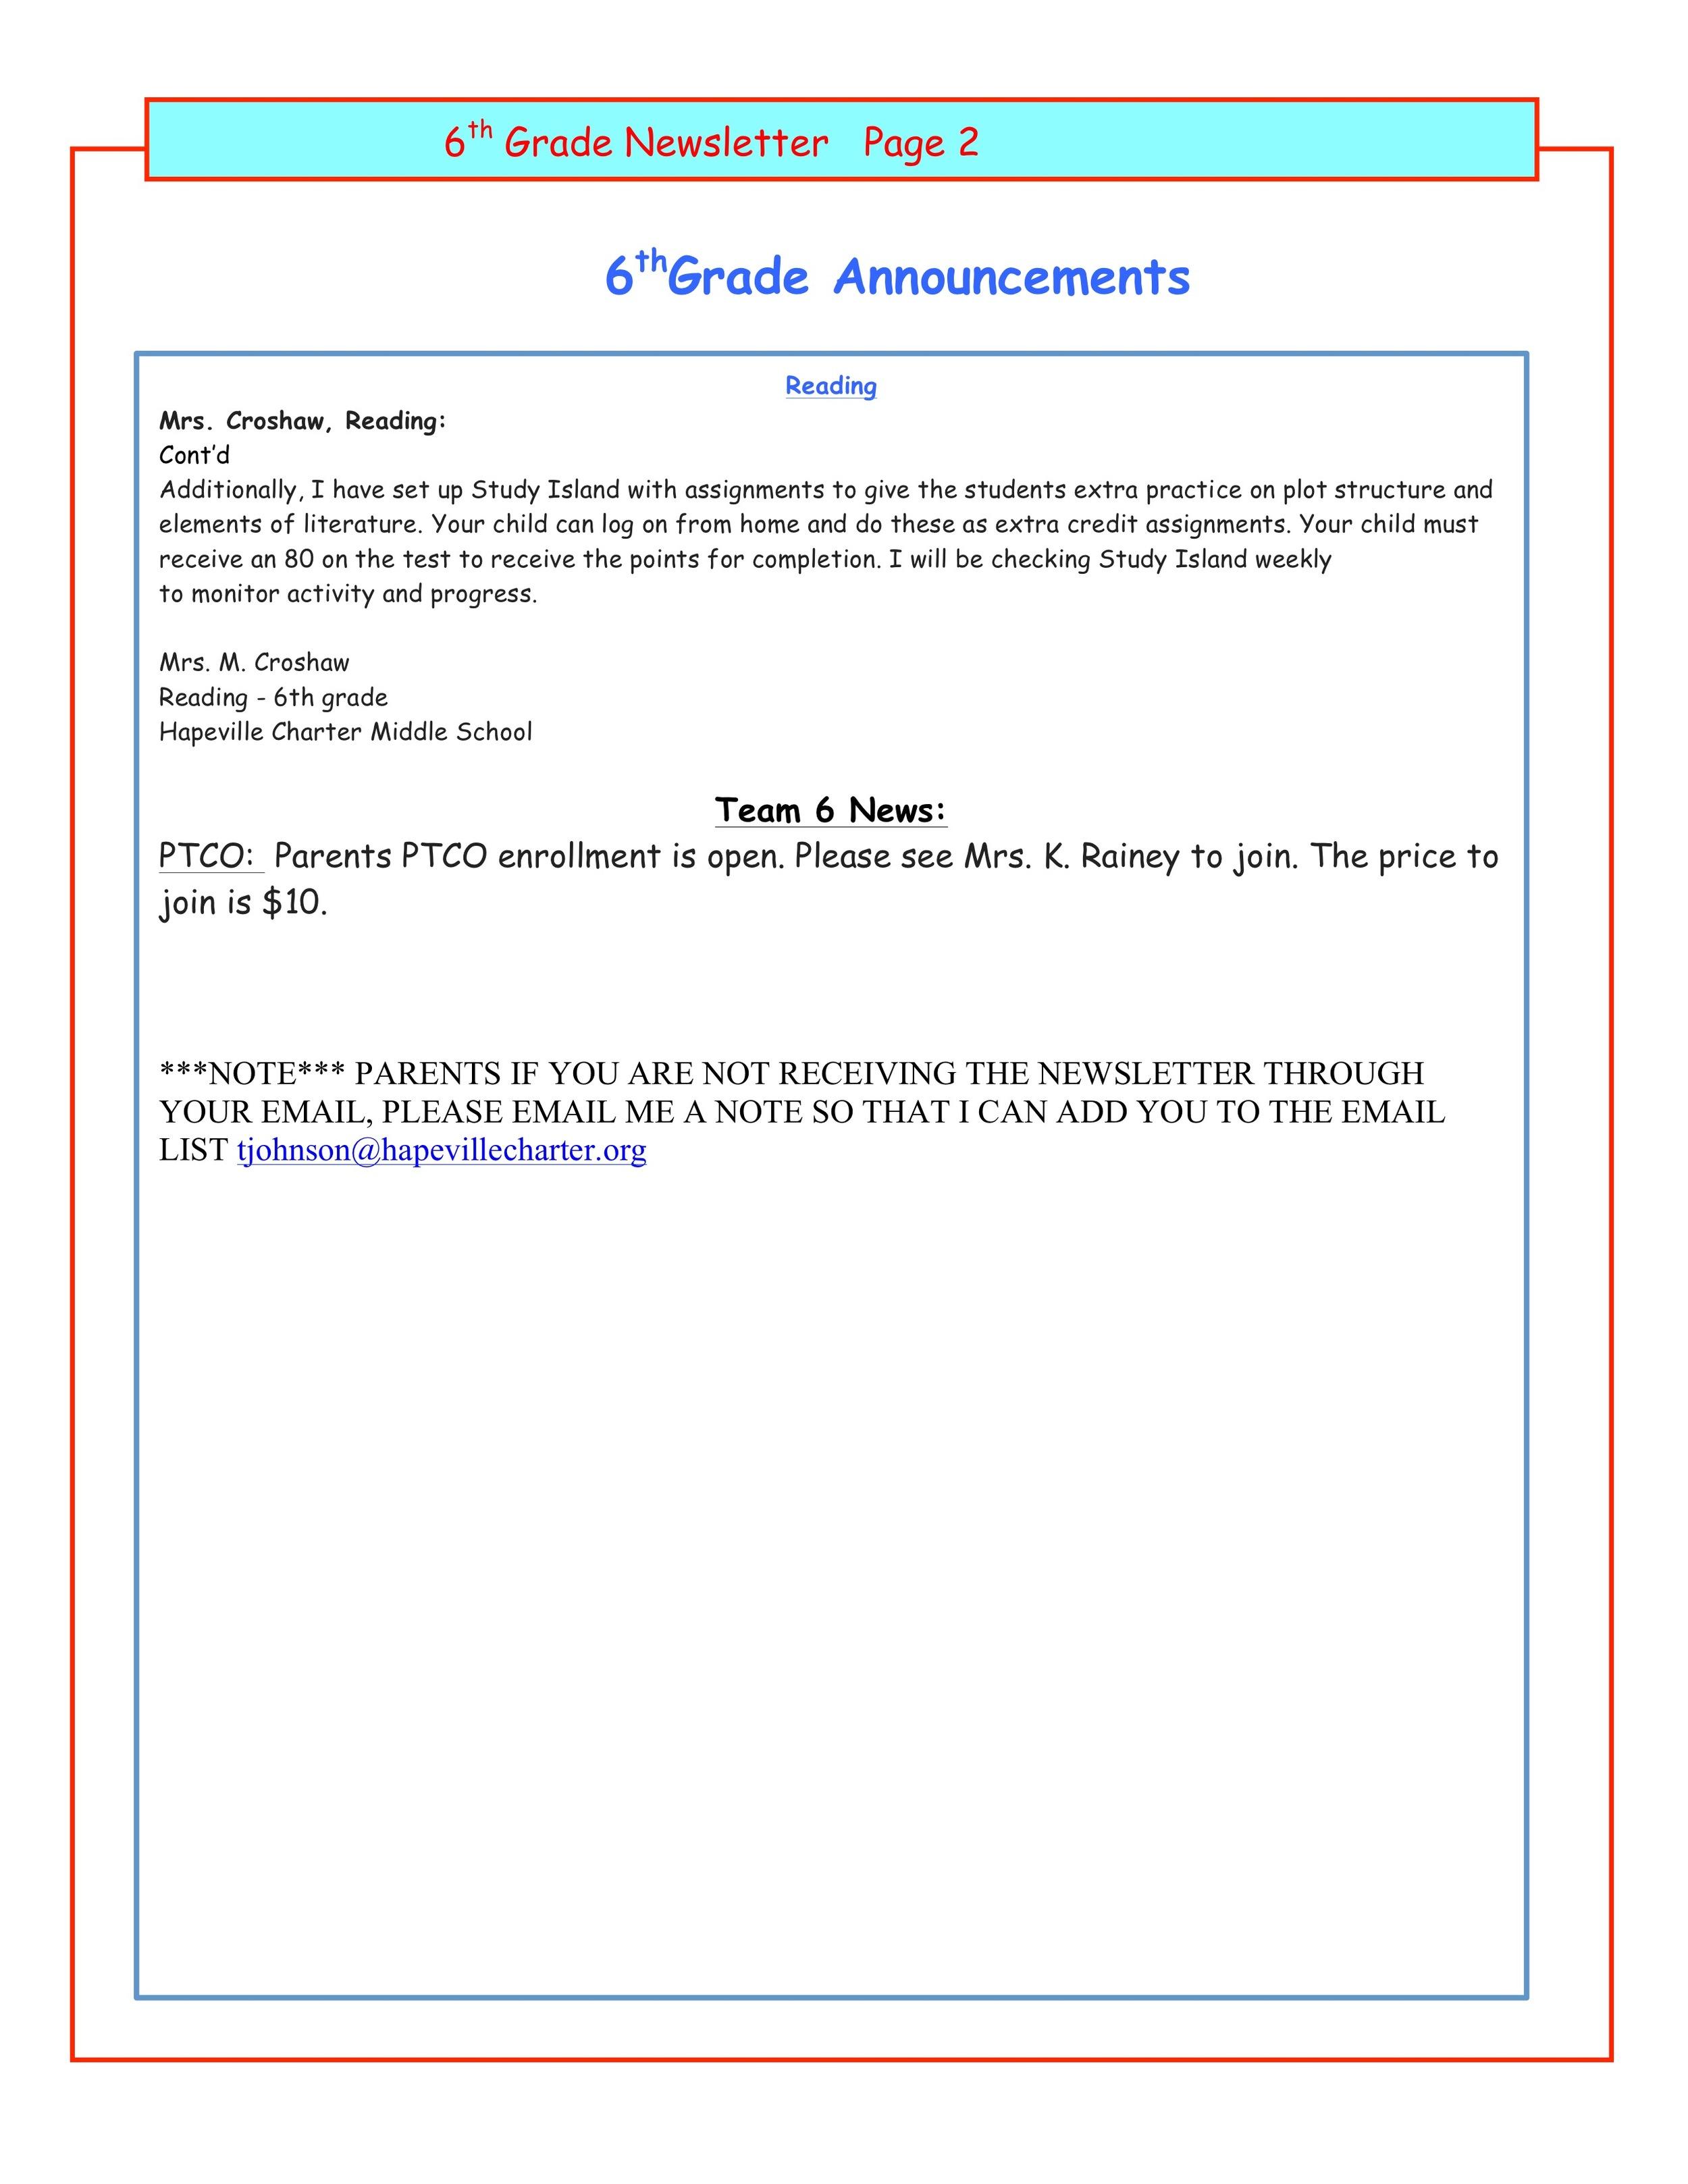 Newsletter Image6th grade 1 25 2.jpeg